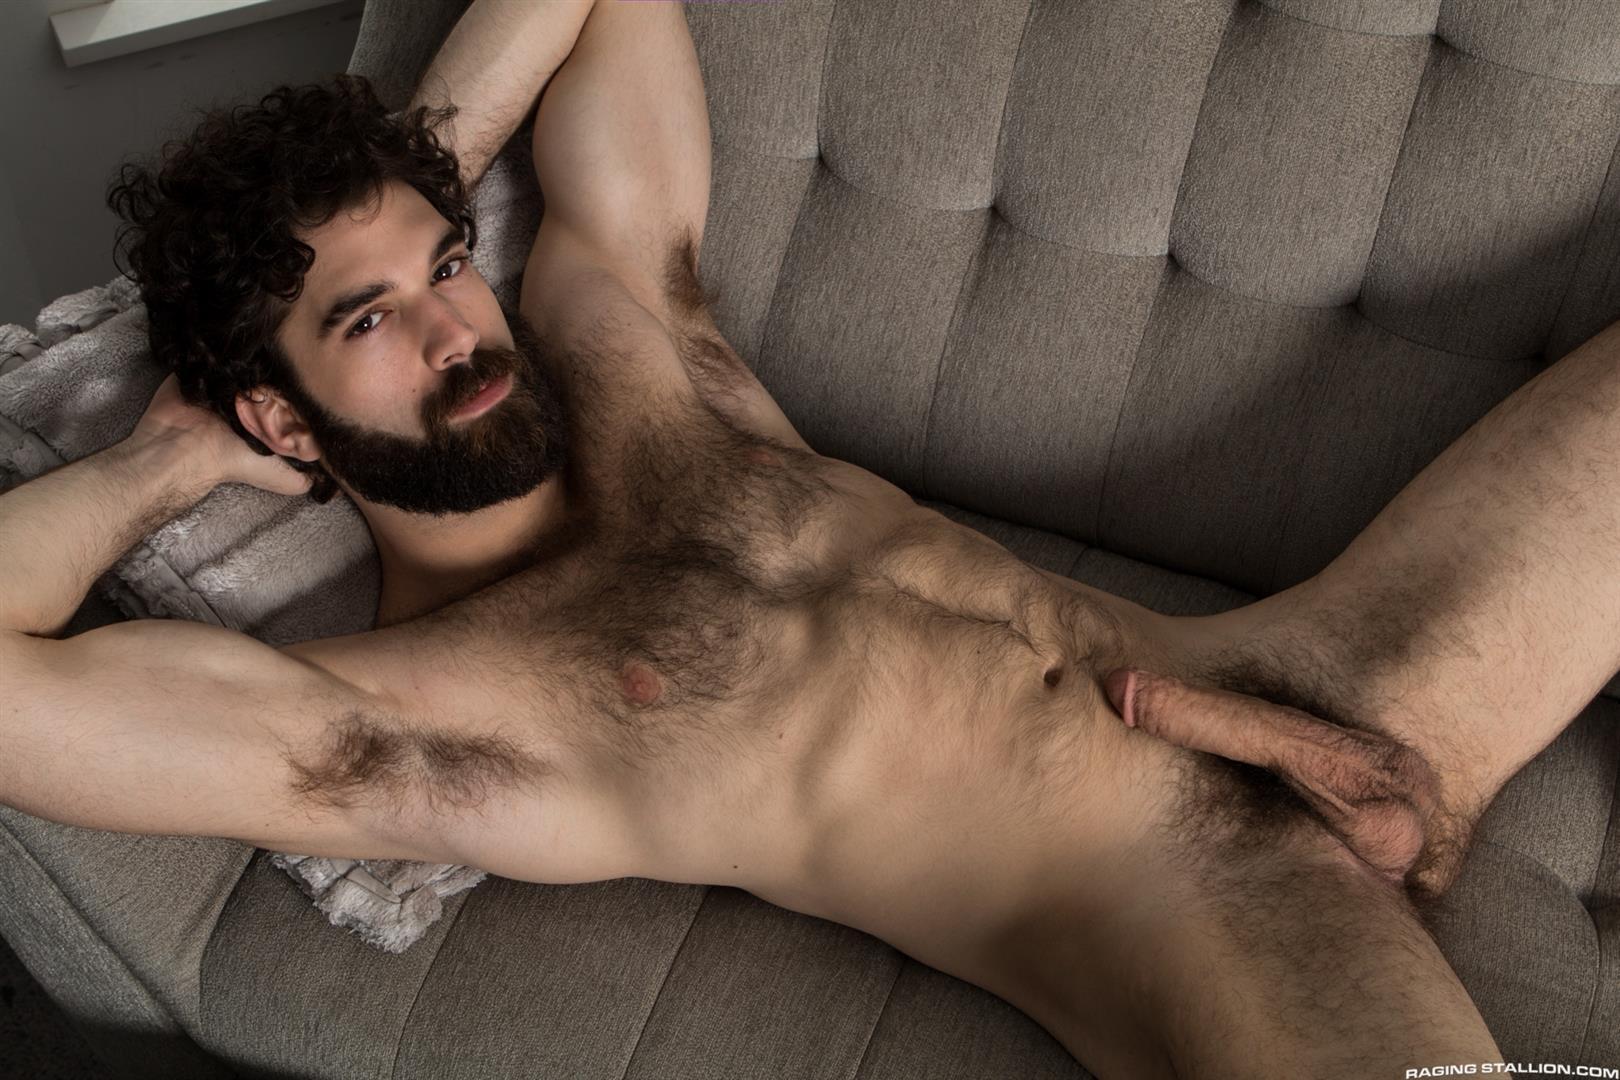 Raging-Stallion-Tegan-Zayne-and-Jason-Vario-Gay-Arab-Sucking-Cock-Video-05 Hairy Naked Syrian Tegan Zayne Sucks A Big Uncut Cock